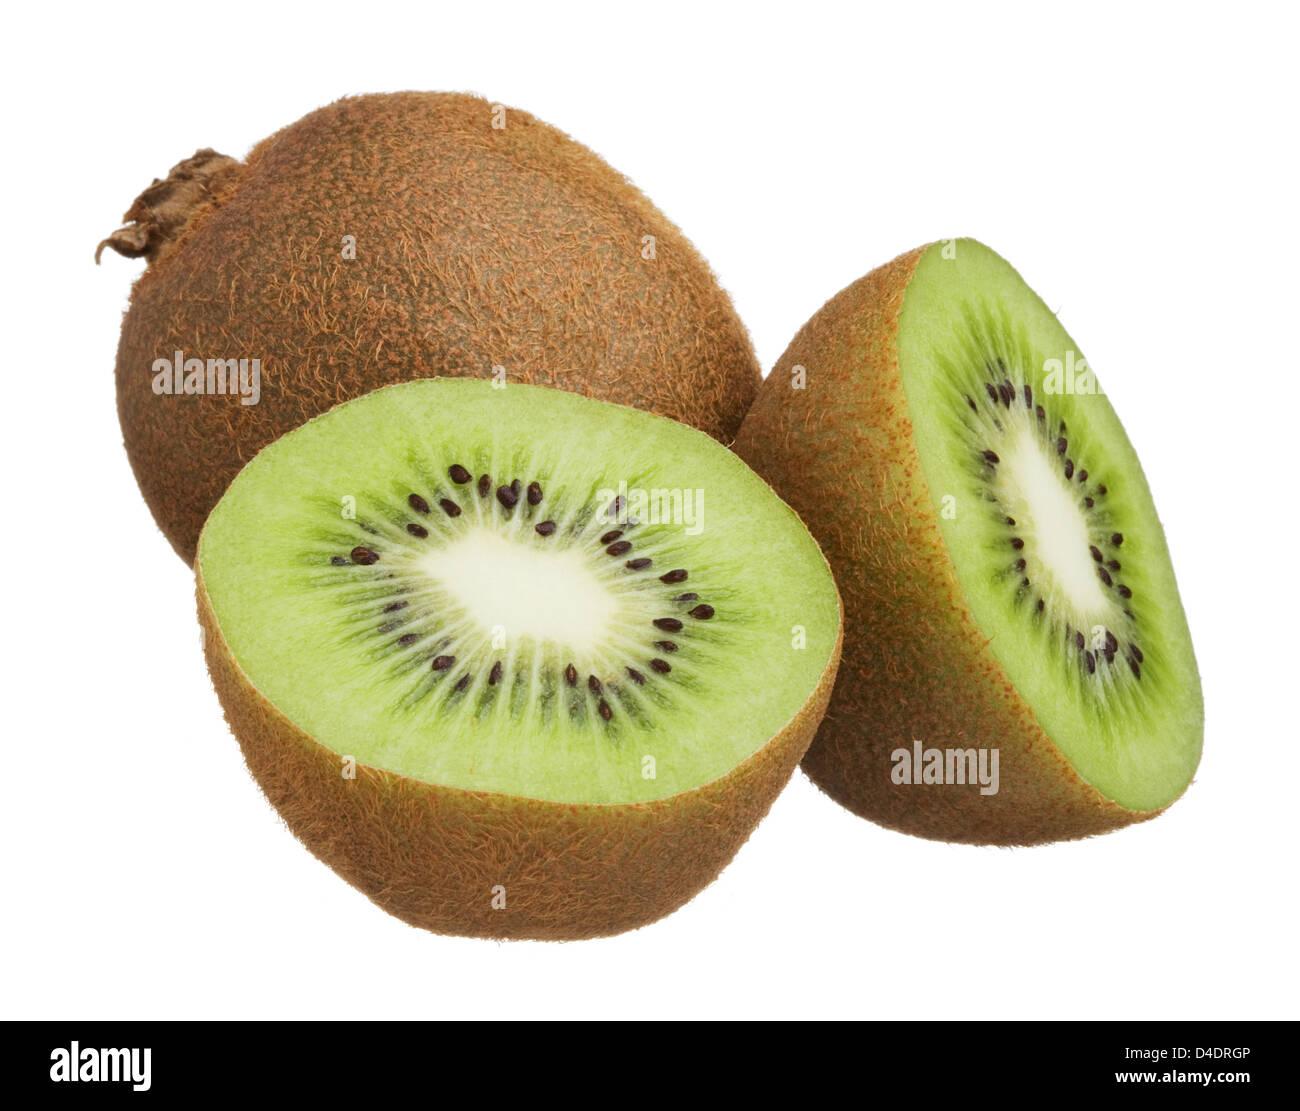 Kiwi cut in half isolated on white background - Stock Image